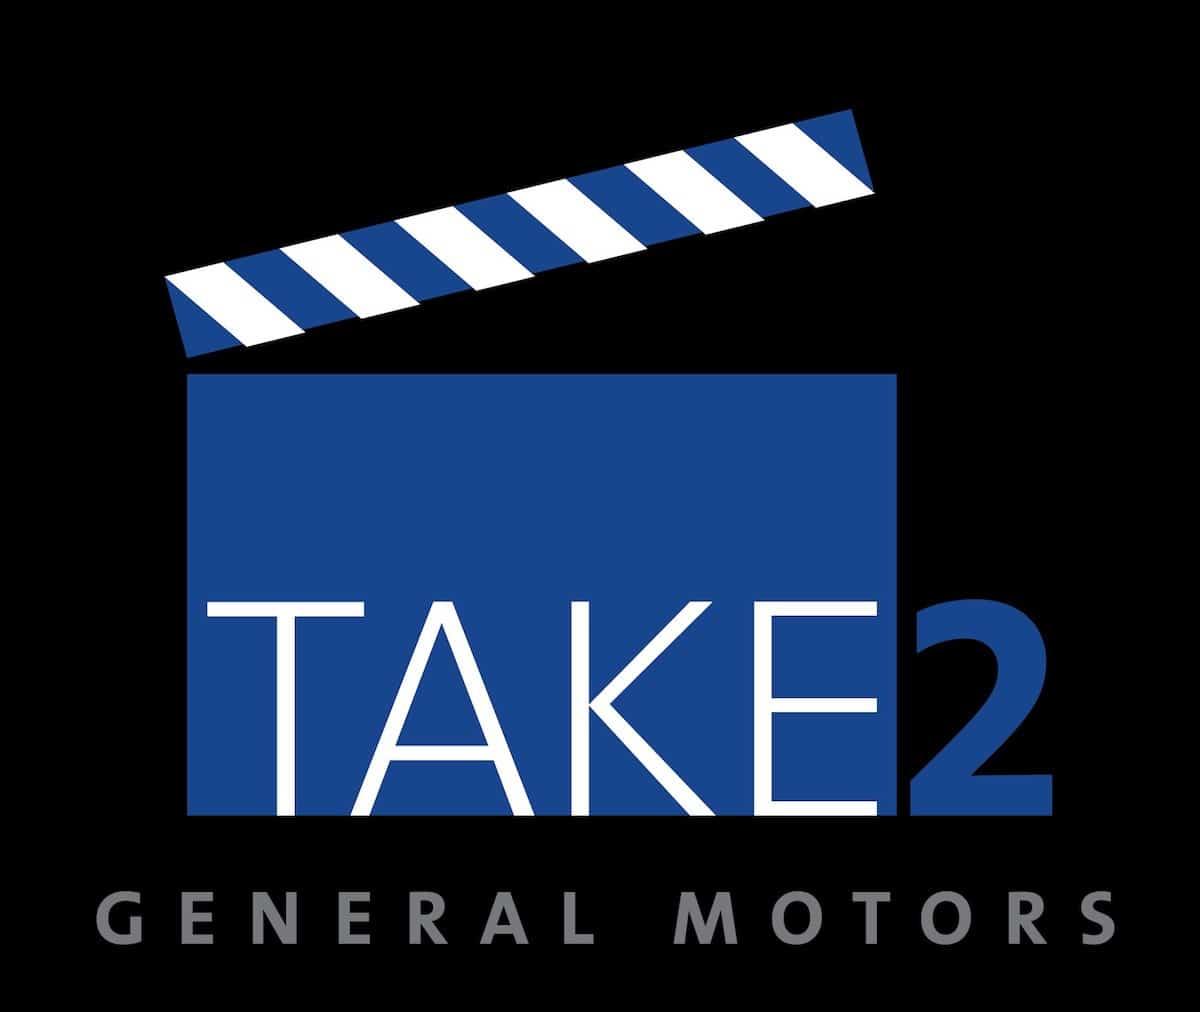 GM Plans to Expand its Take 2 Program